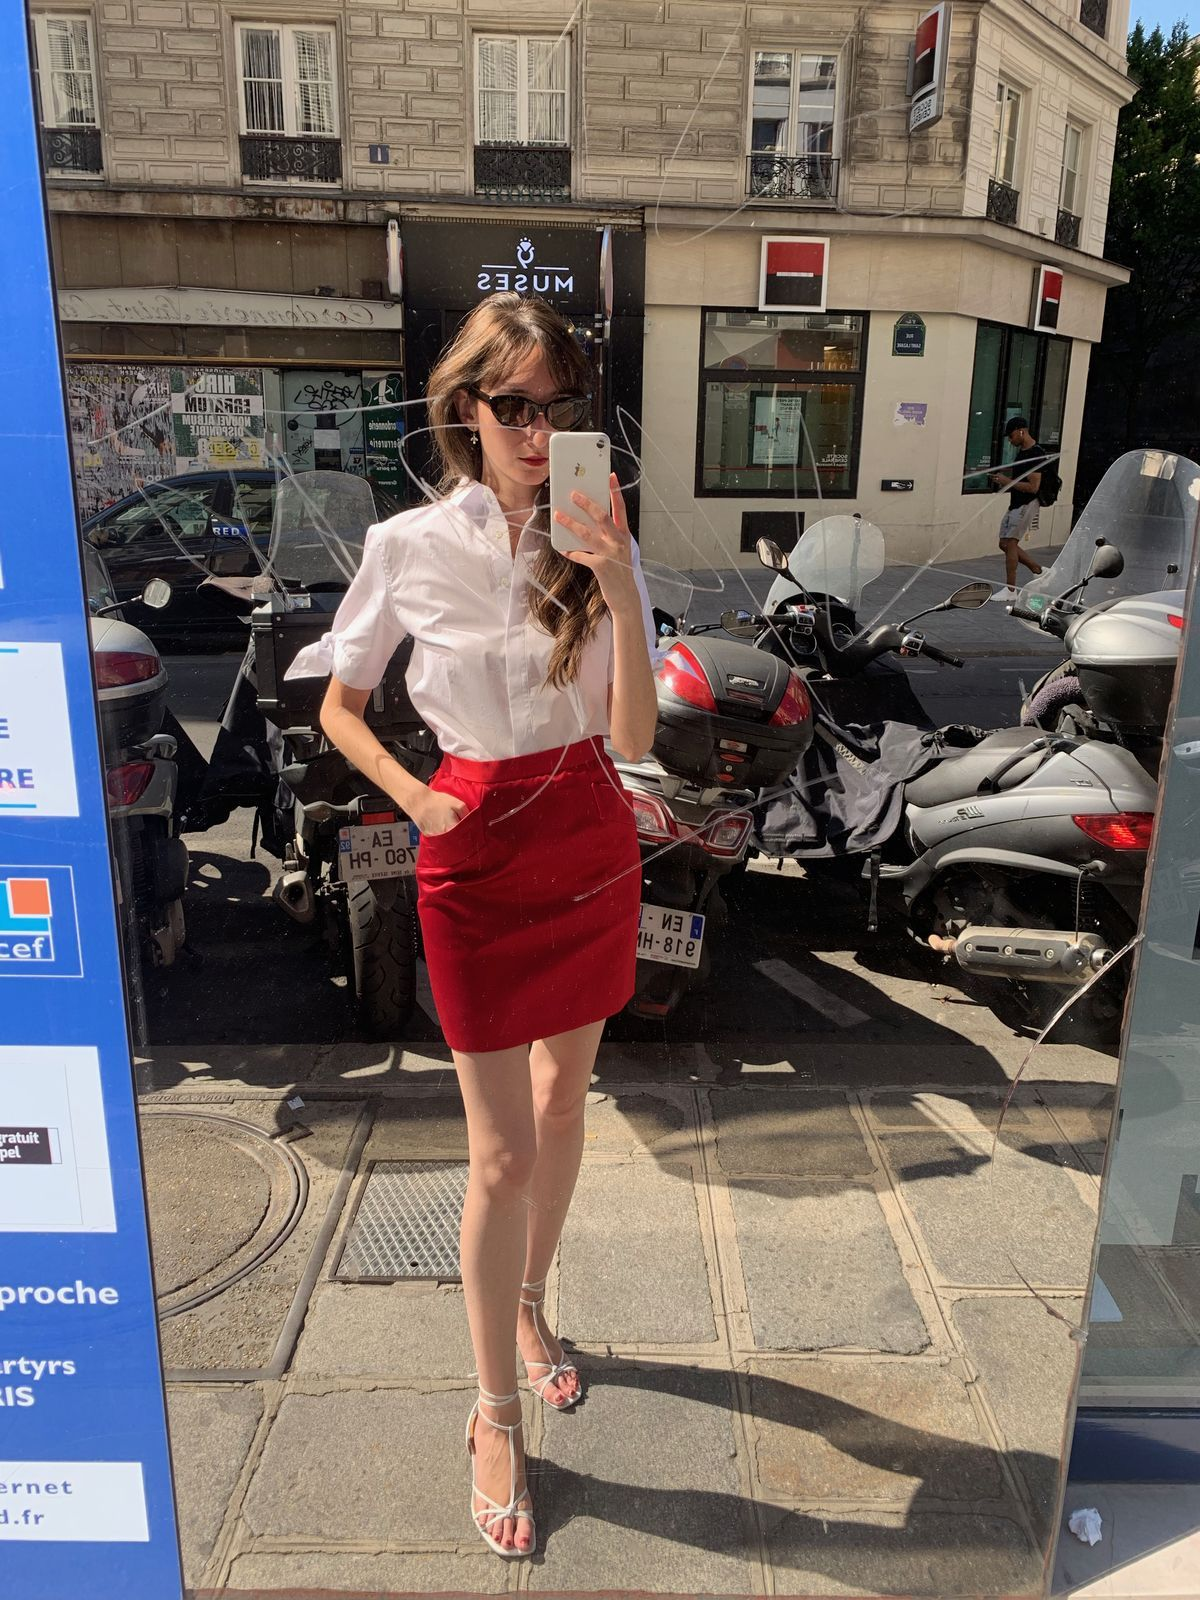 Vintage YSL skirt and Figaret shirt